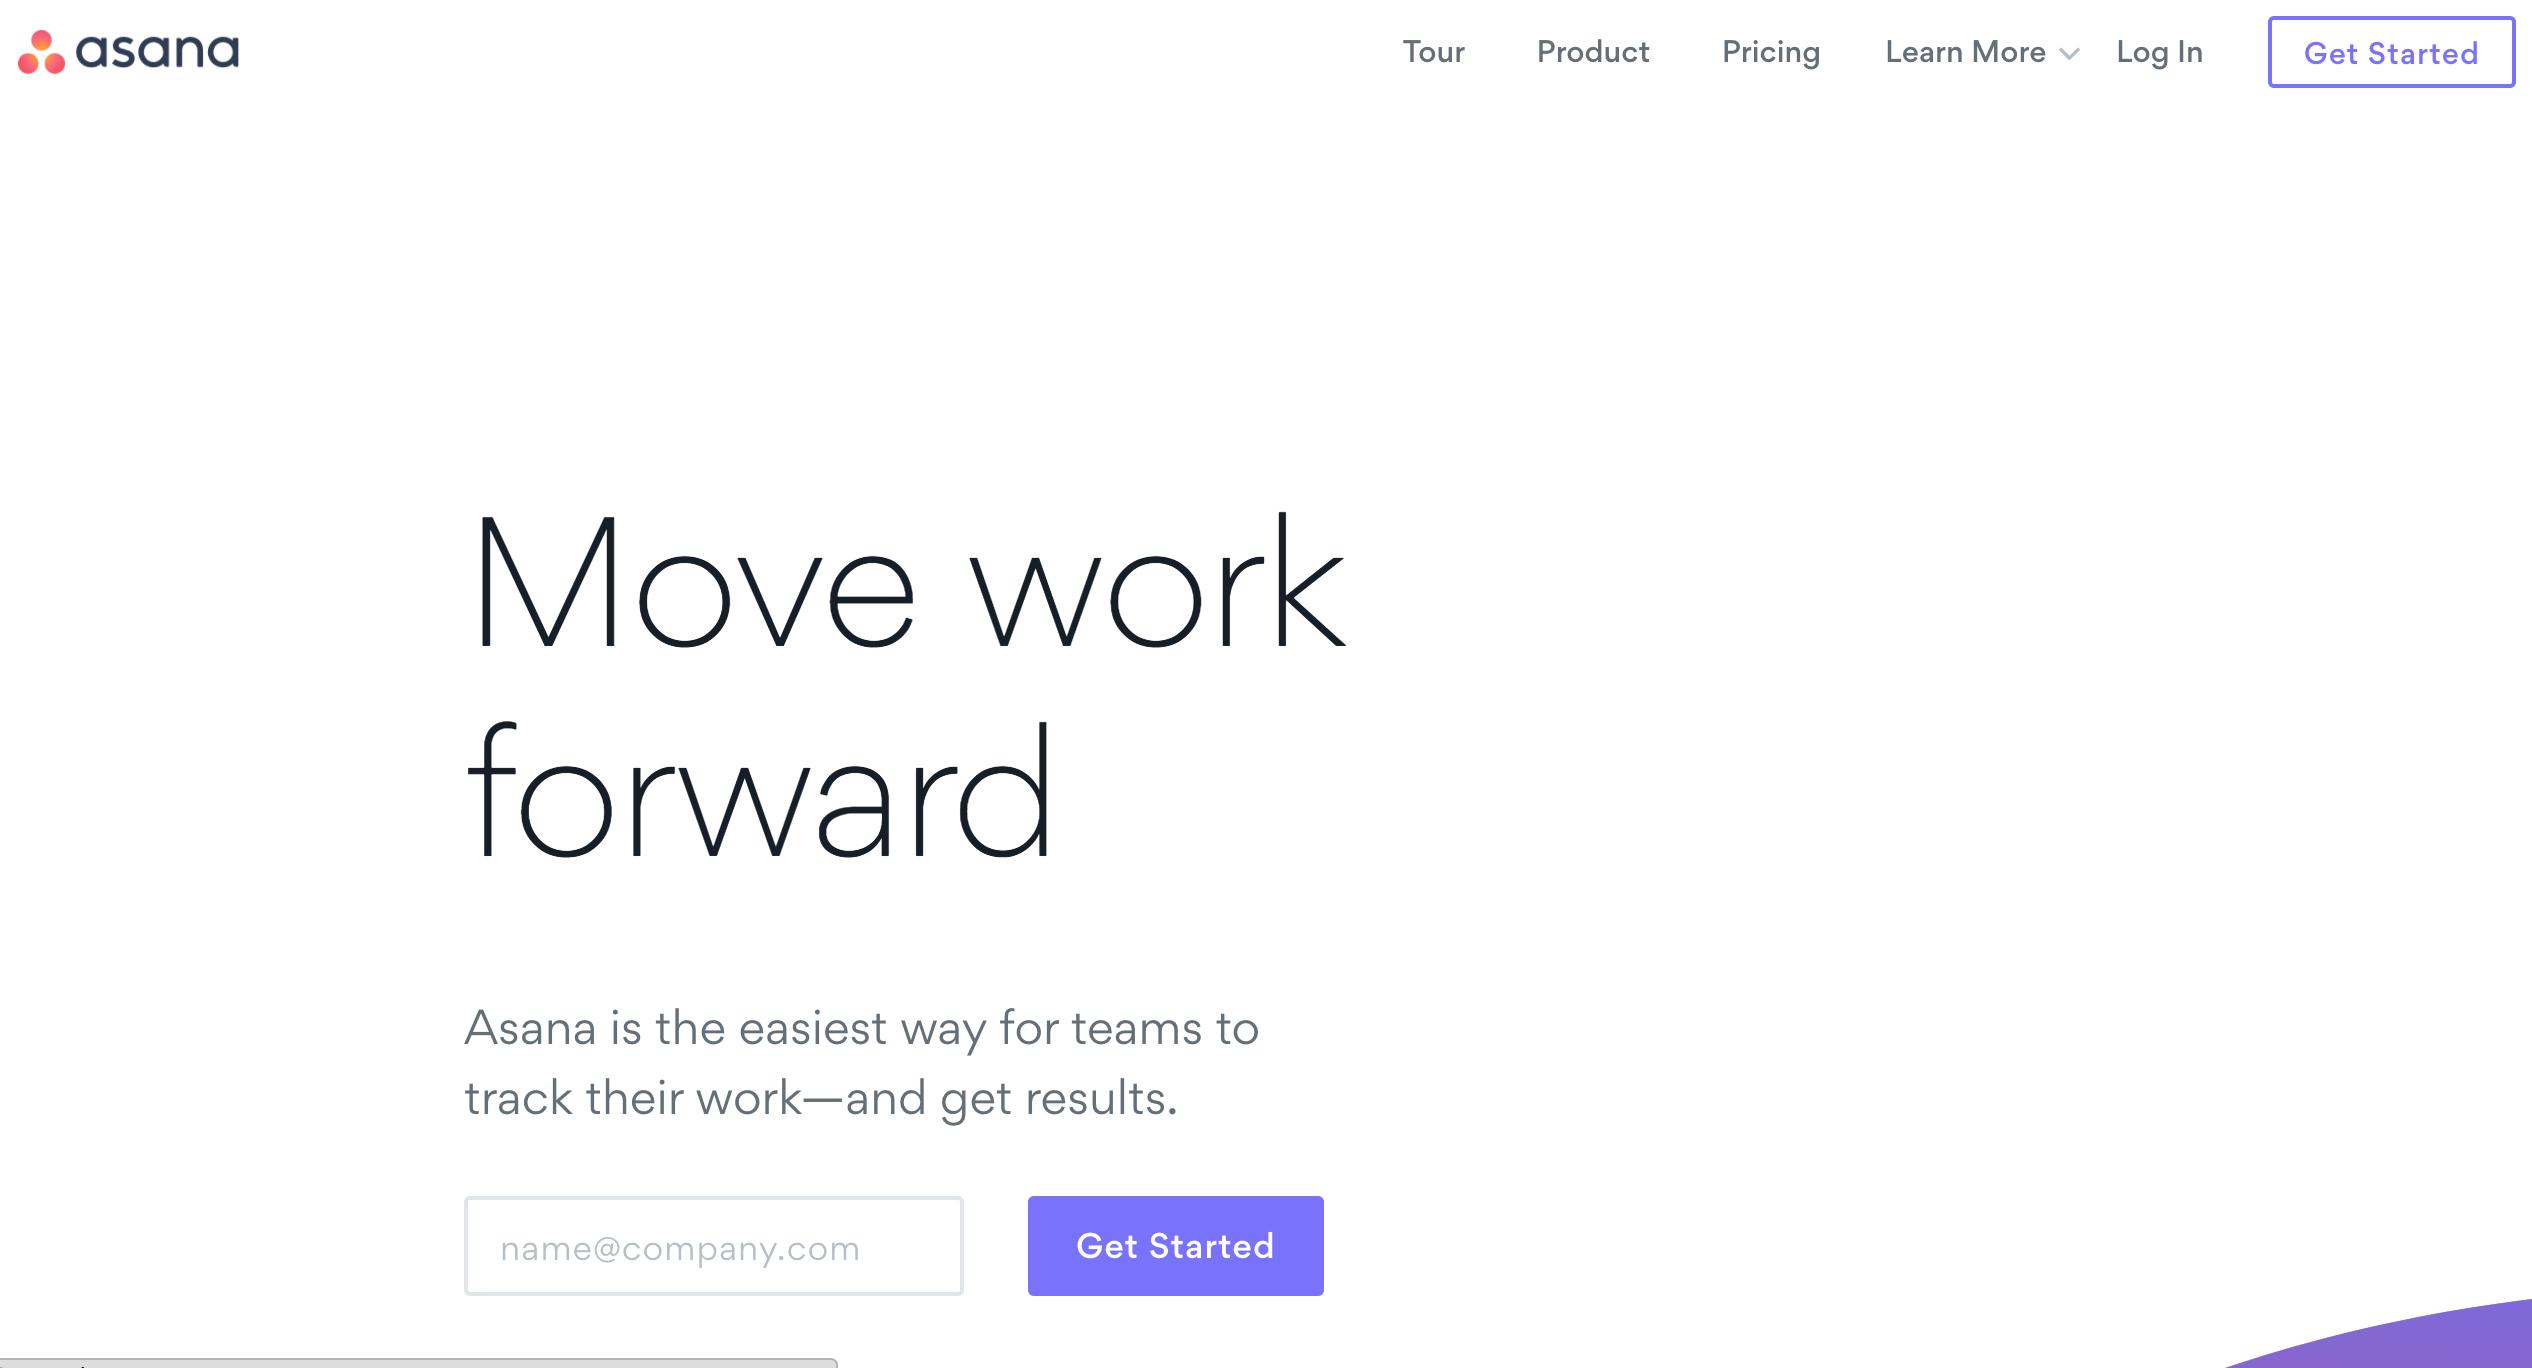 asana management tool